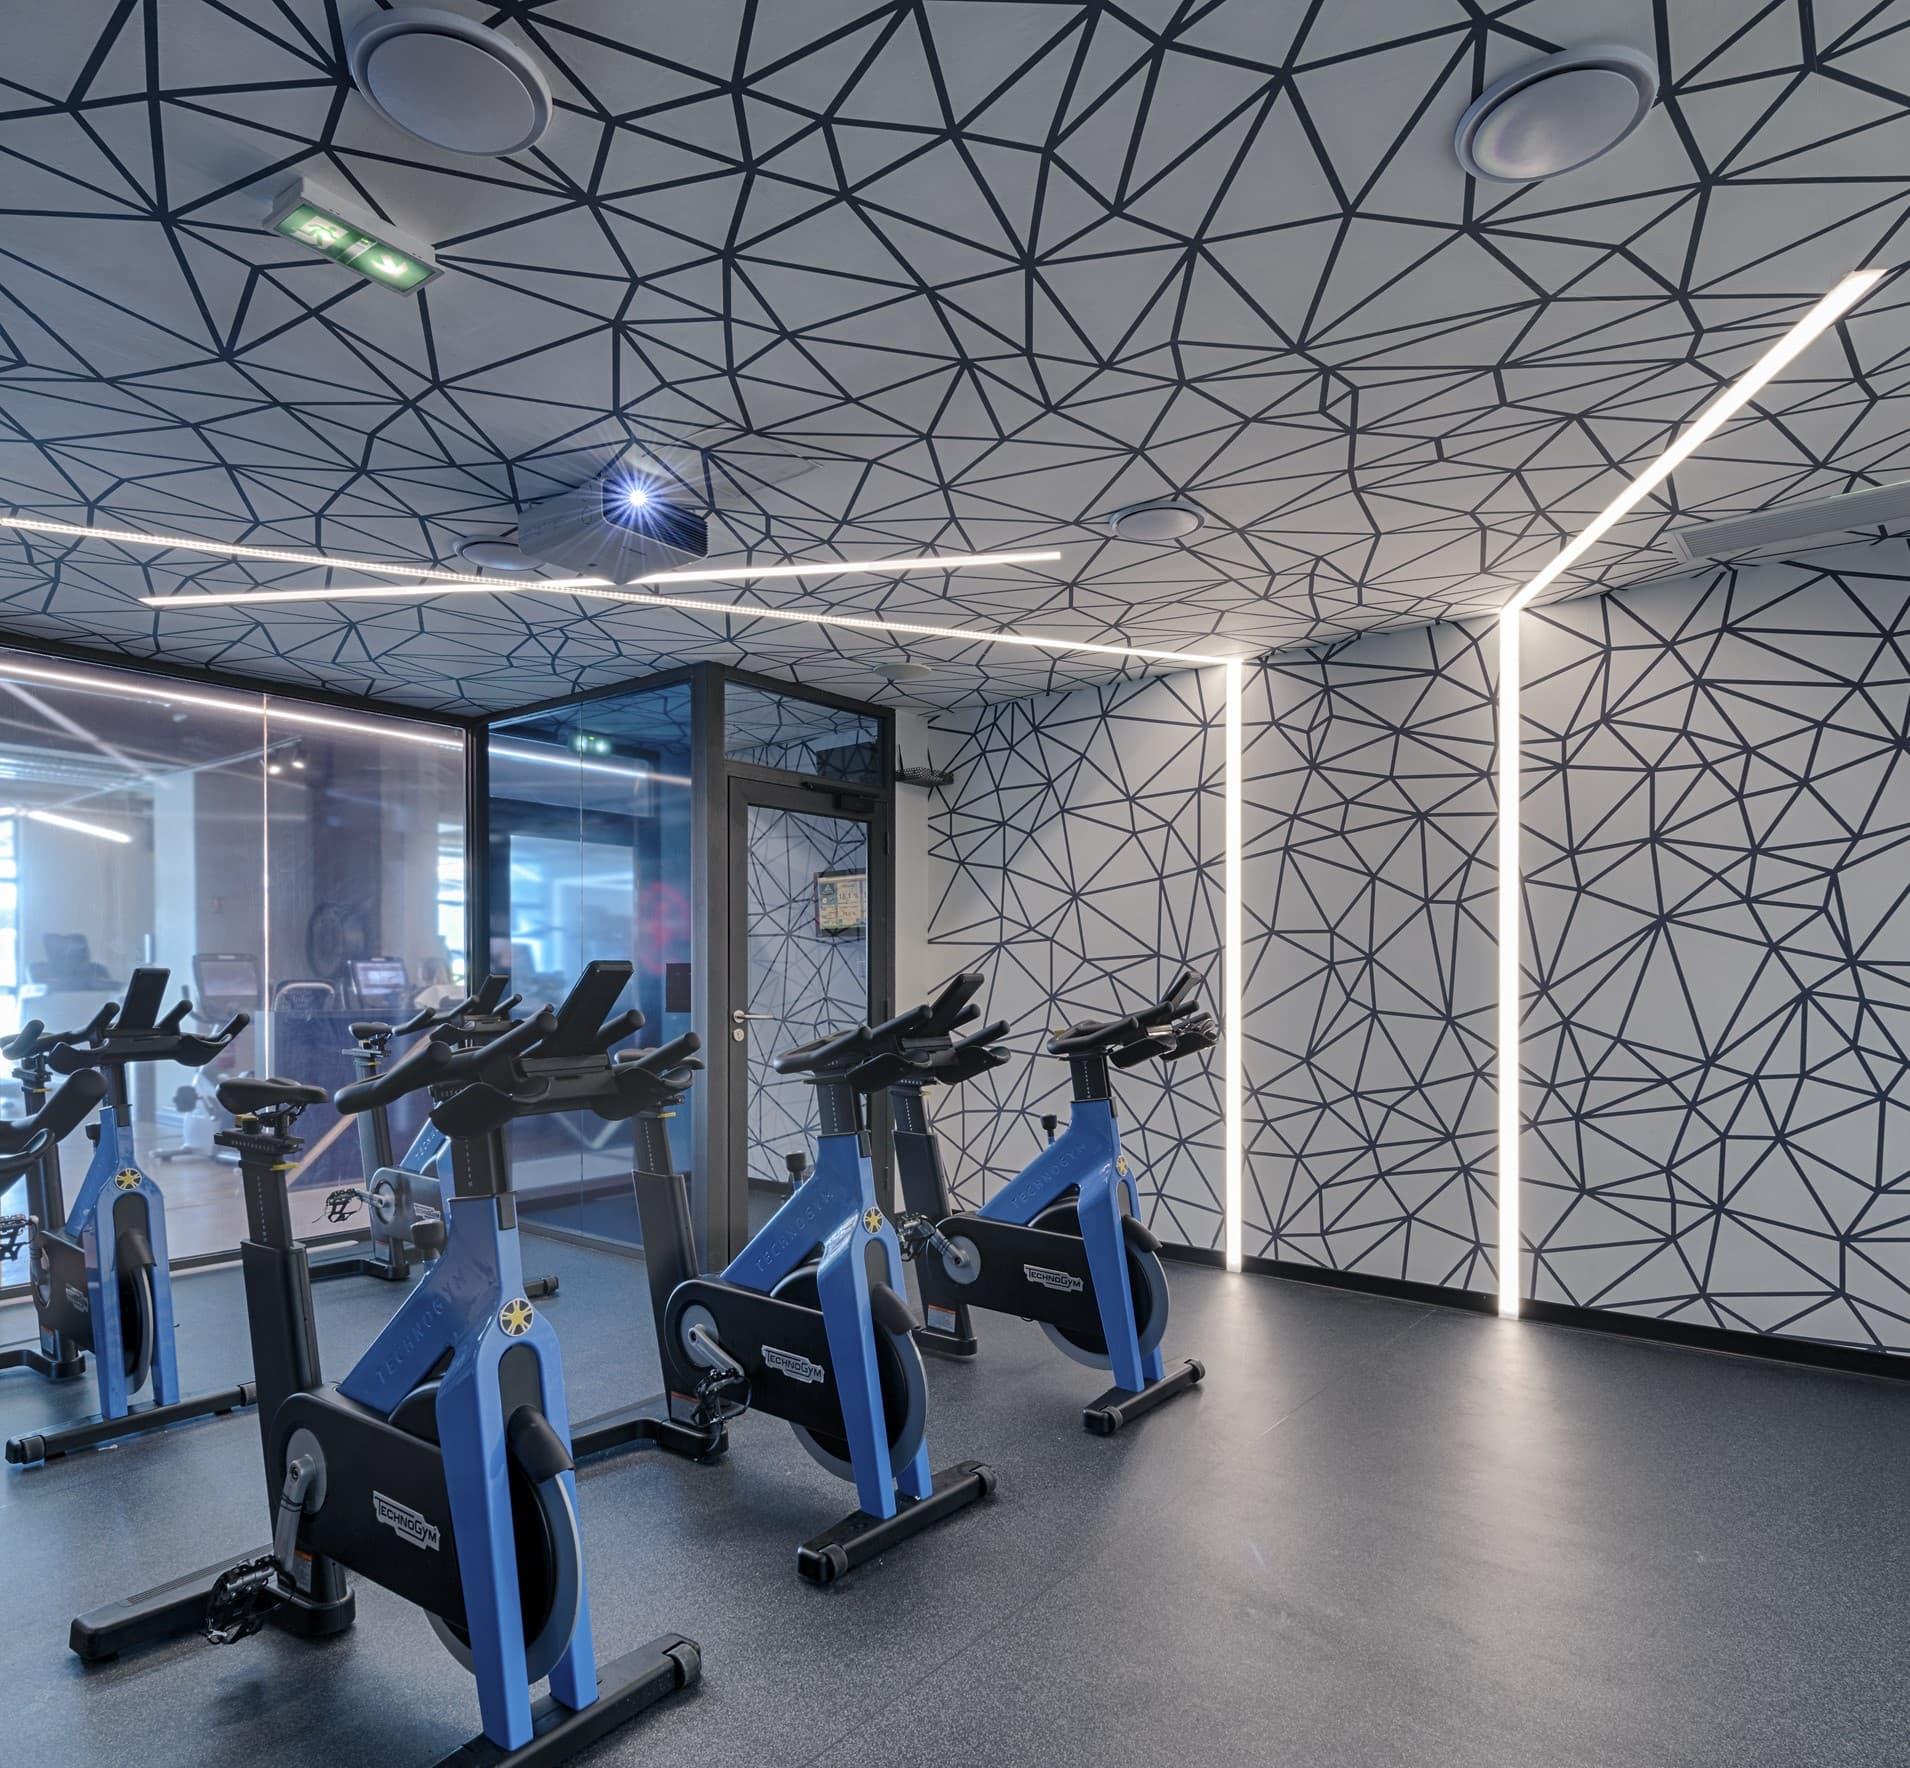 Fissure lumineuse dans la salle de sport Métabolik